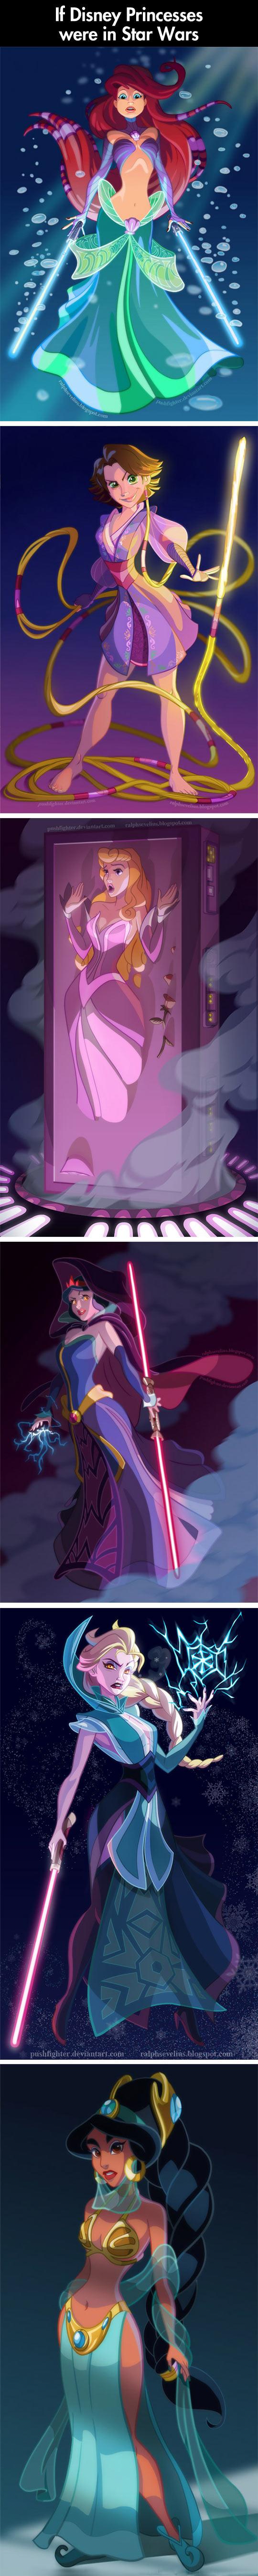 funny-Disney-princesses-Star-Wars